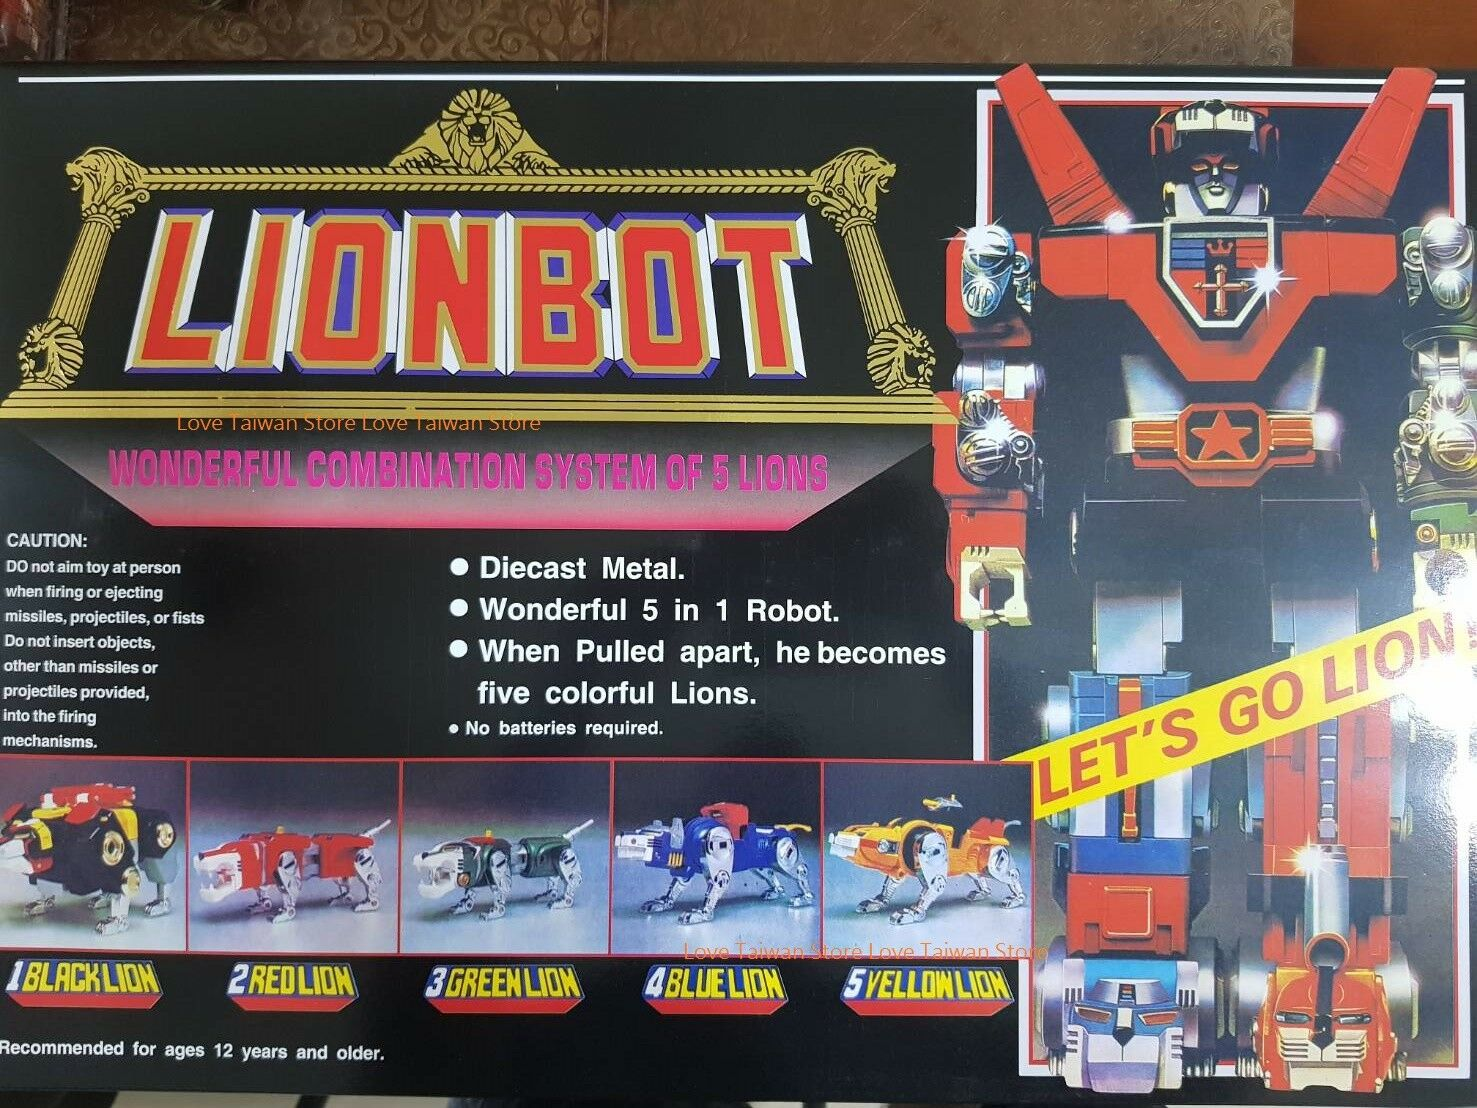 DHL Ship -New Lionbot (Taiwan Version) 1980 Chogokin Die-Cast Metal 5 in 1 Robot